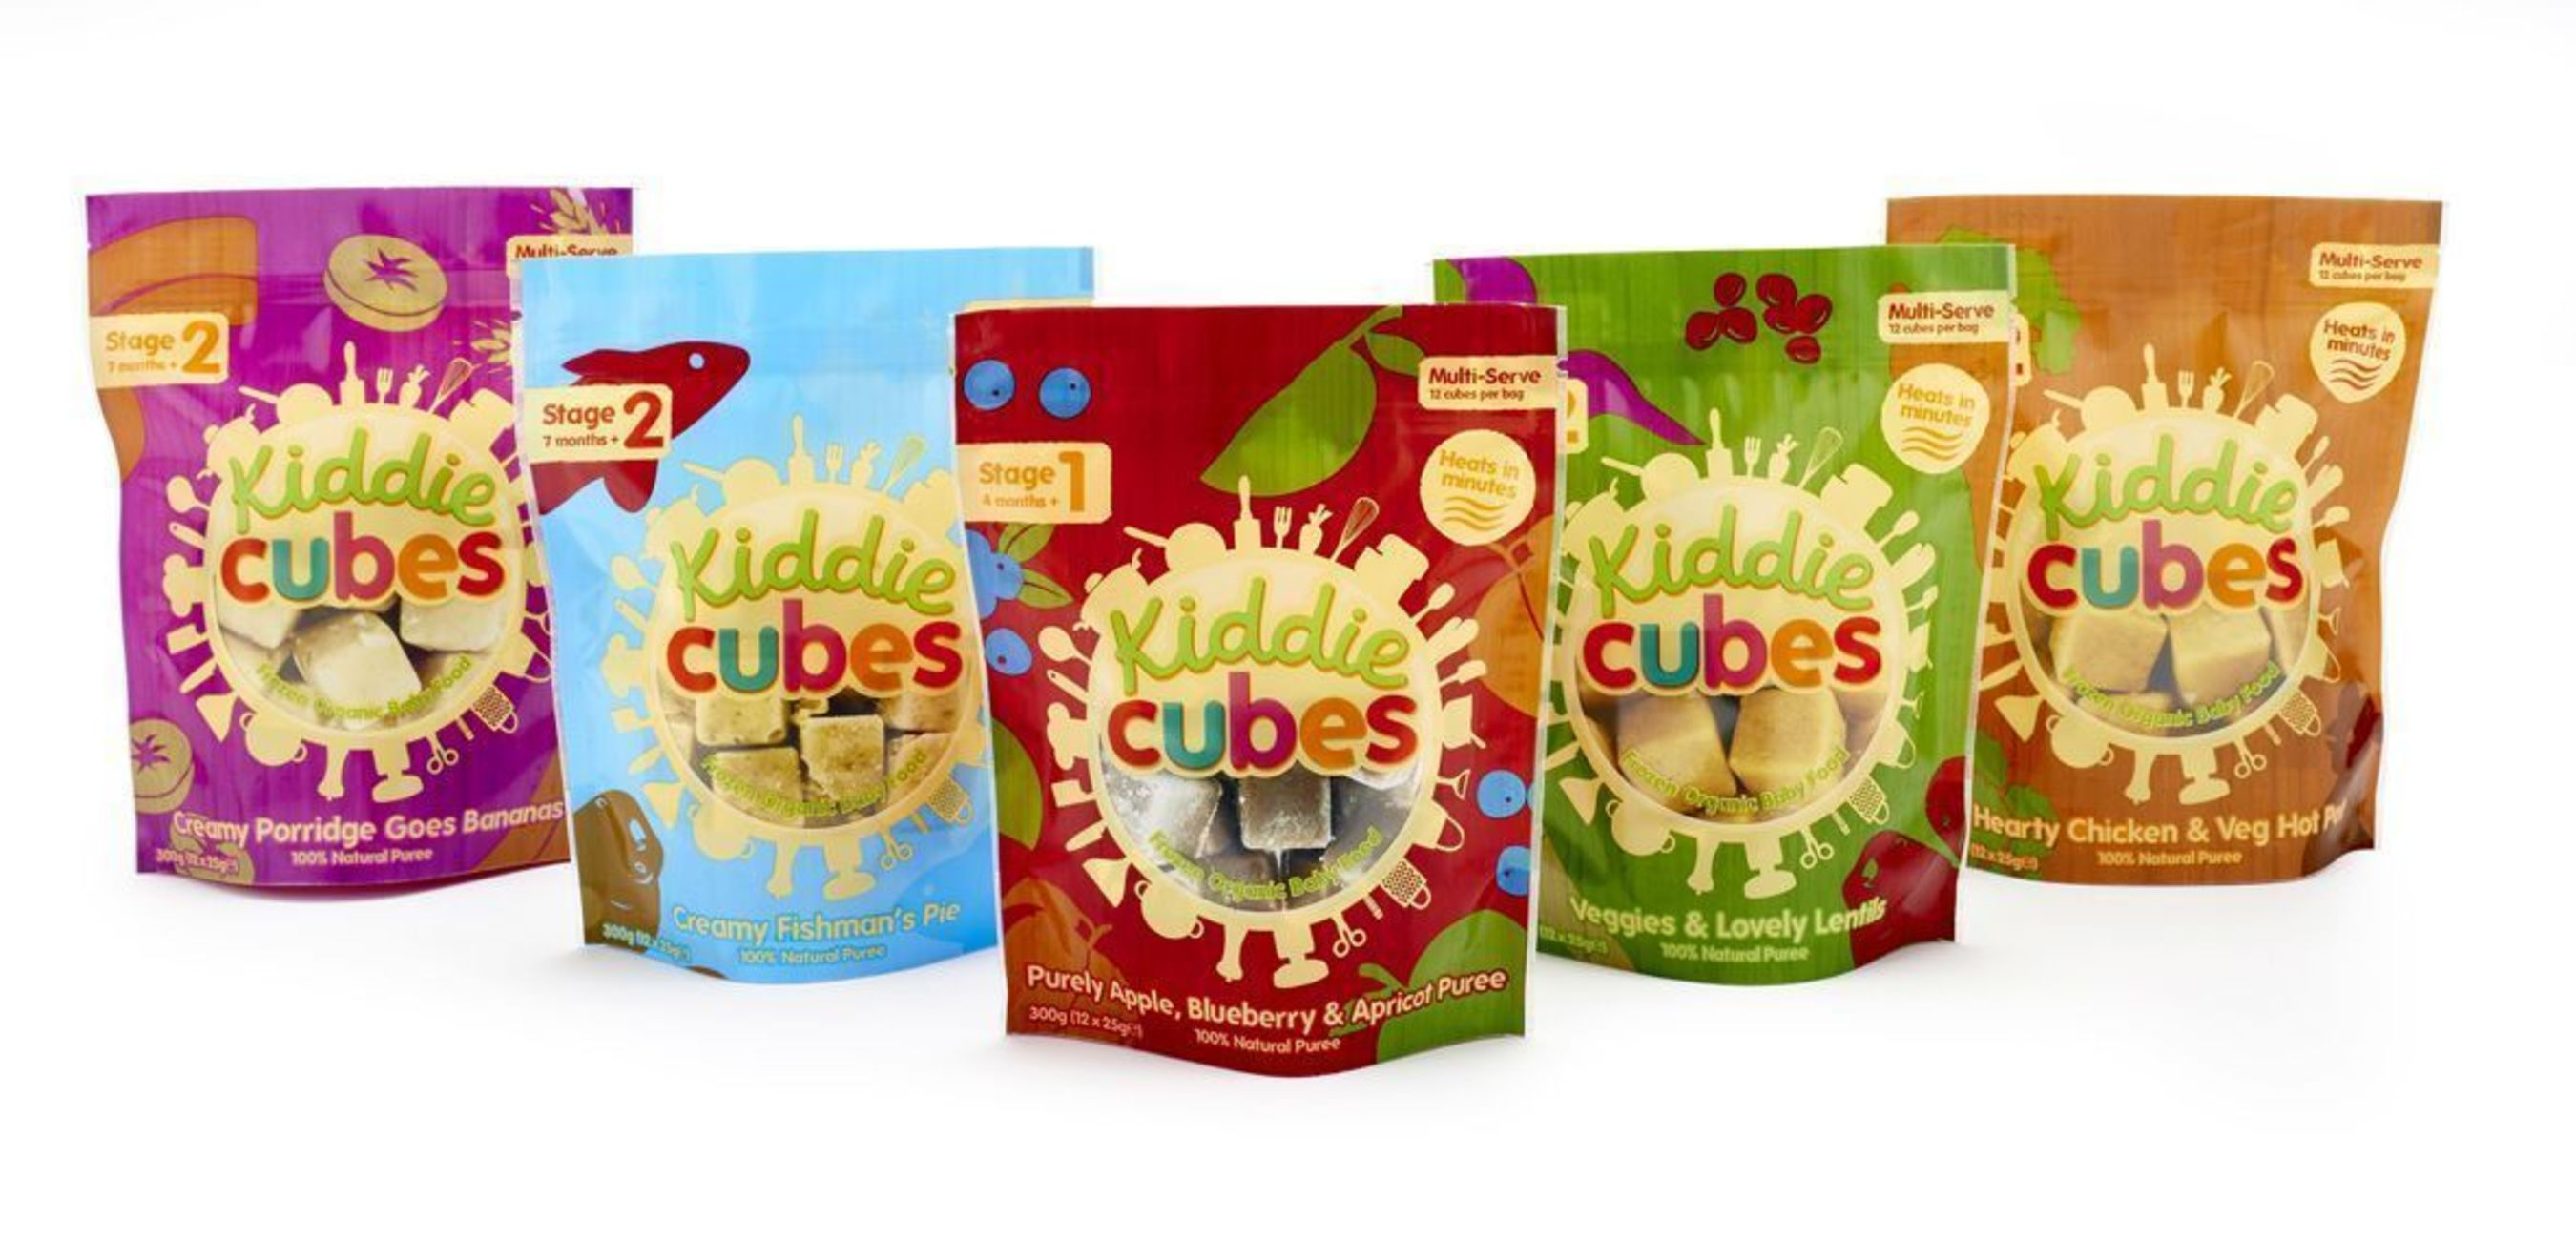 5 of the KiddieCubes range (www.kiddiecubes.com). (PRNewsFoto/KiddieCubes Ltd)